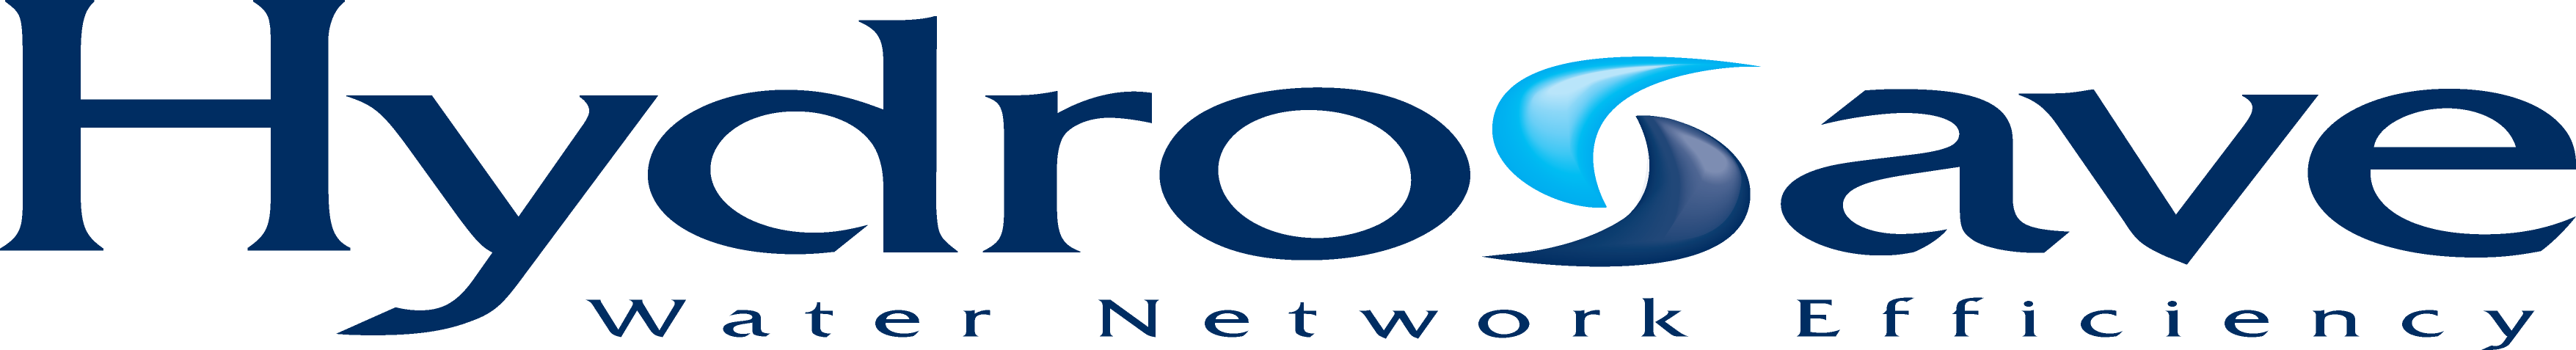 HydroSave-logo-Transparent-1